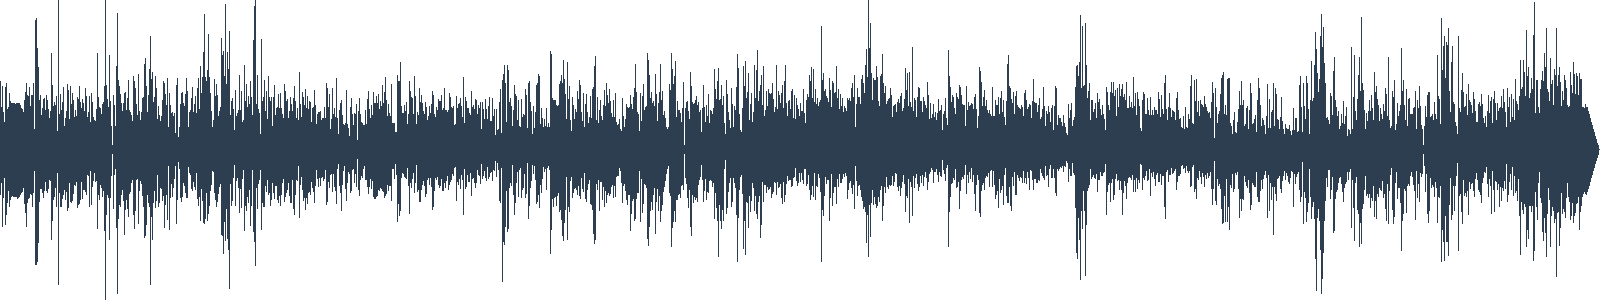 Speciál - Co posloucháme #31 waveform